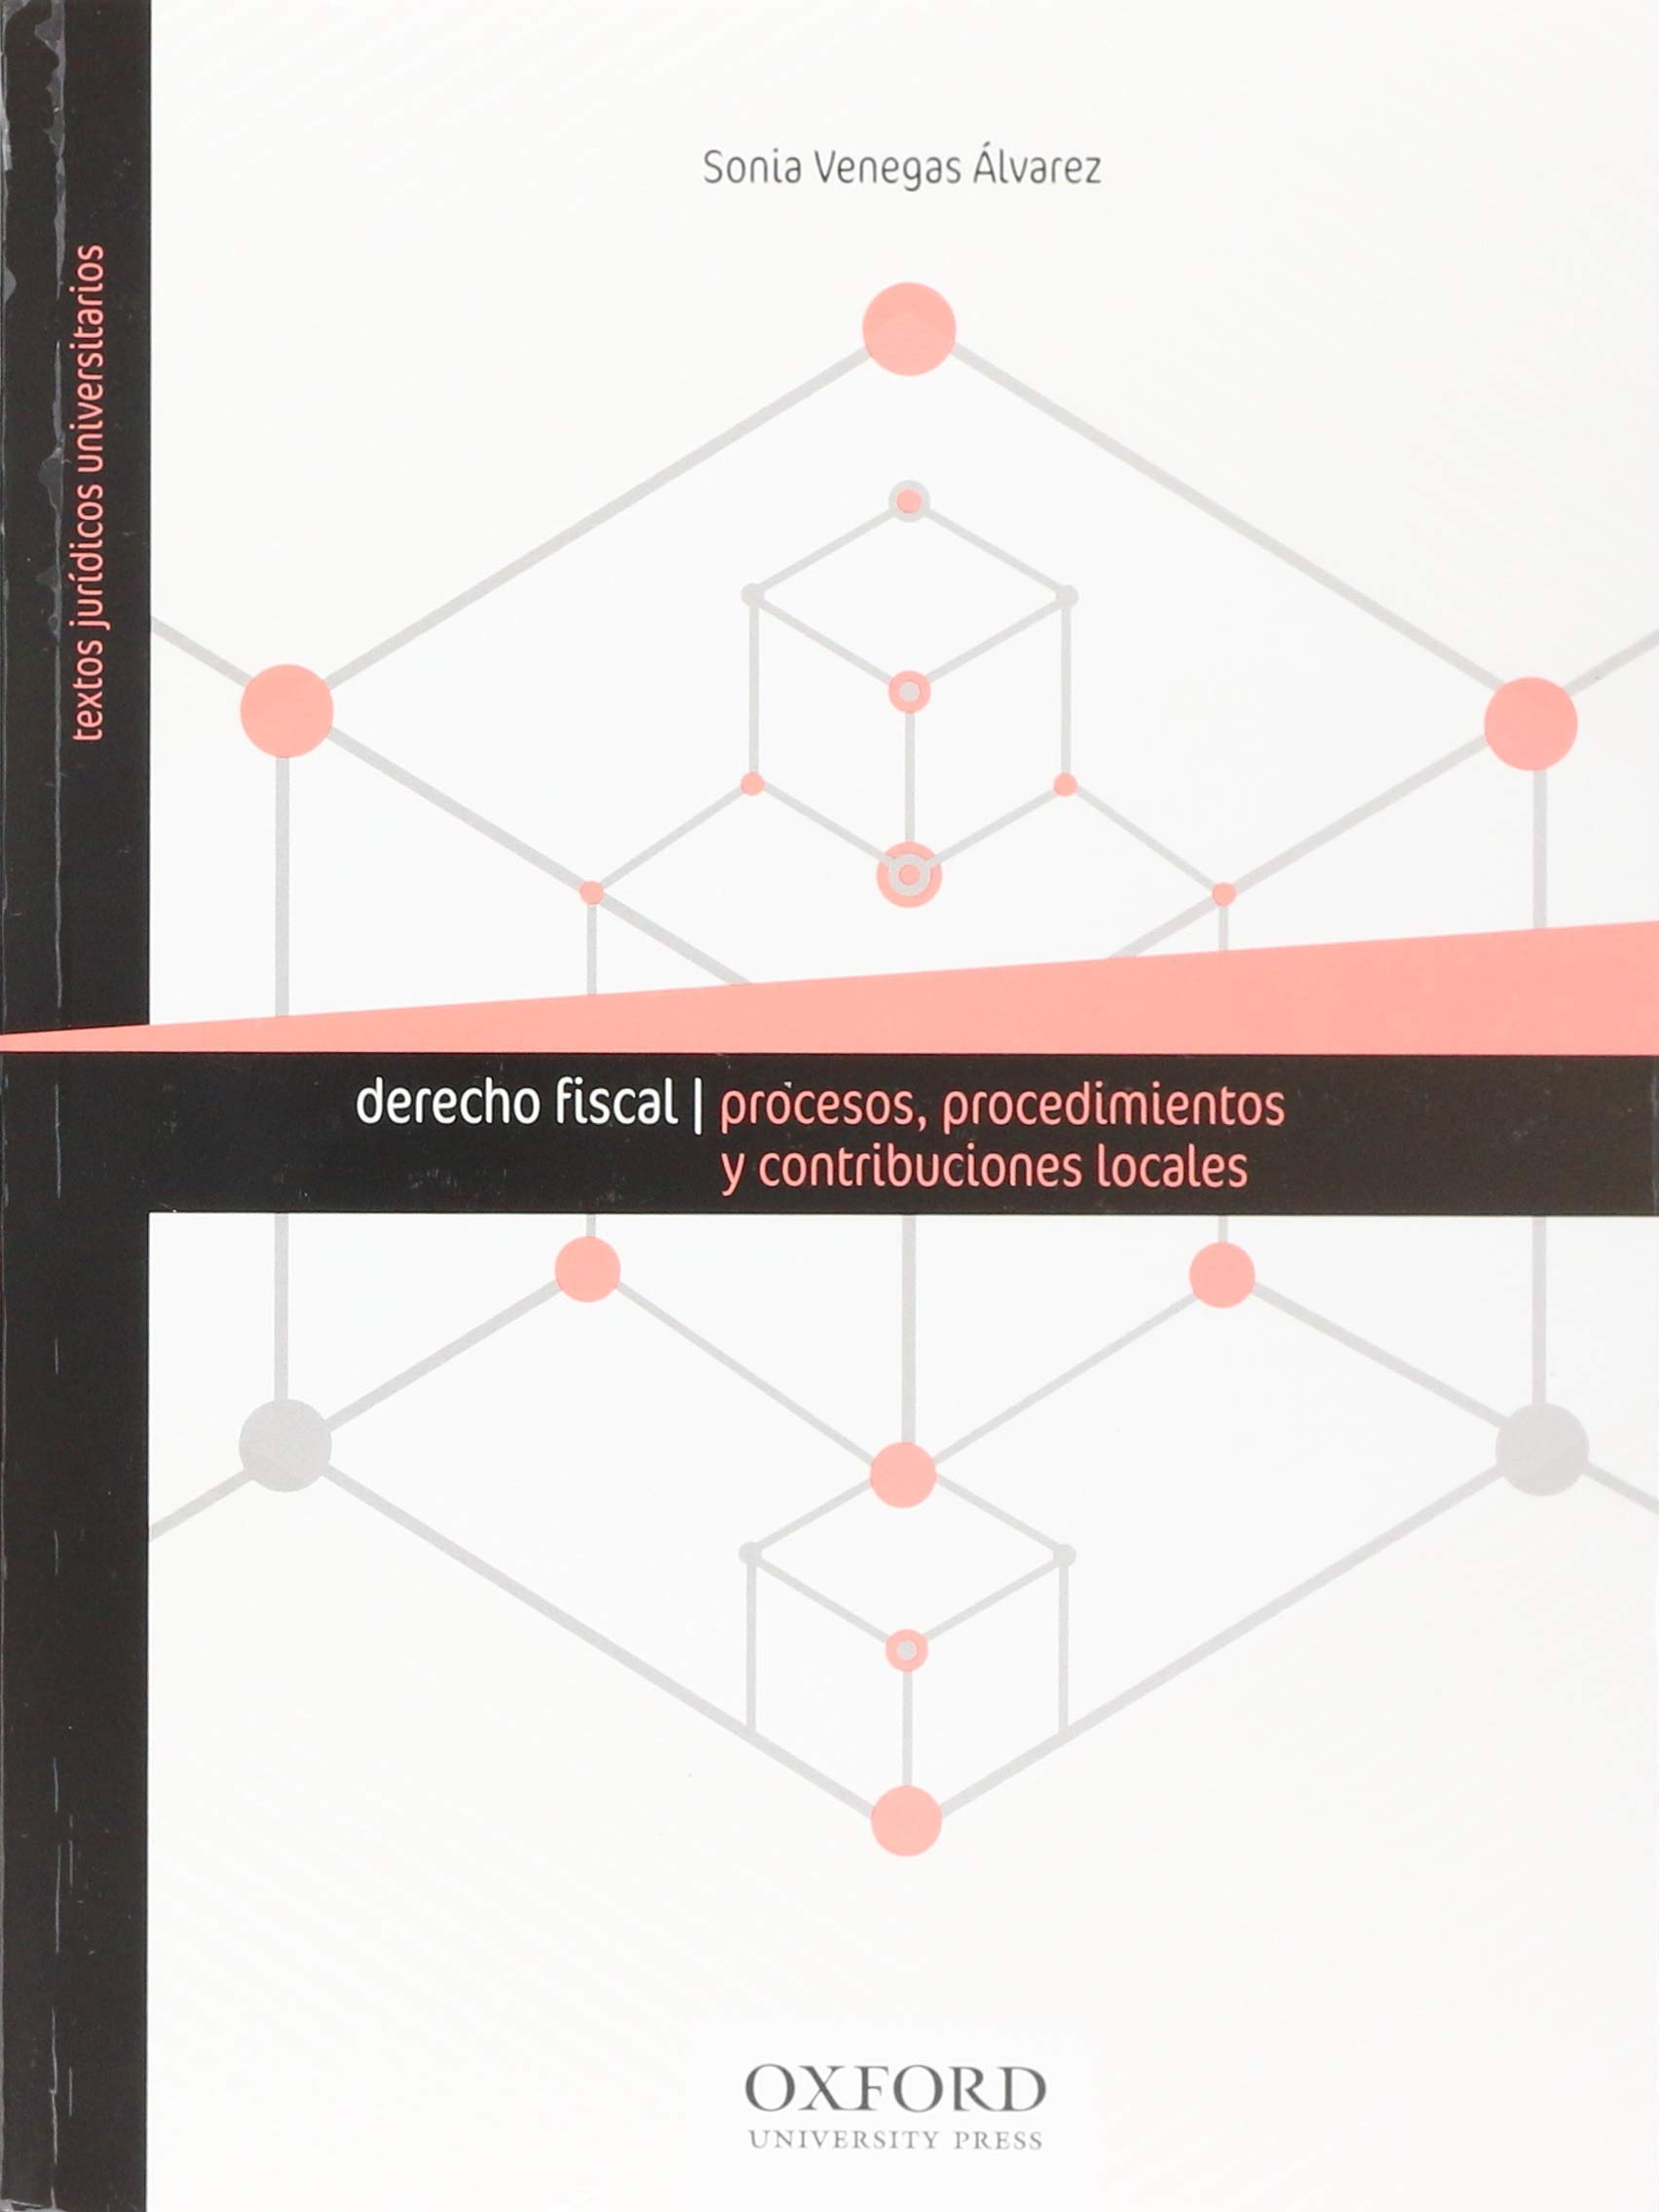 libro de derecho fiscal de sonia venegas alvarez pdf